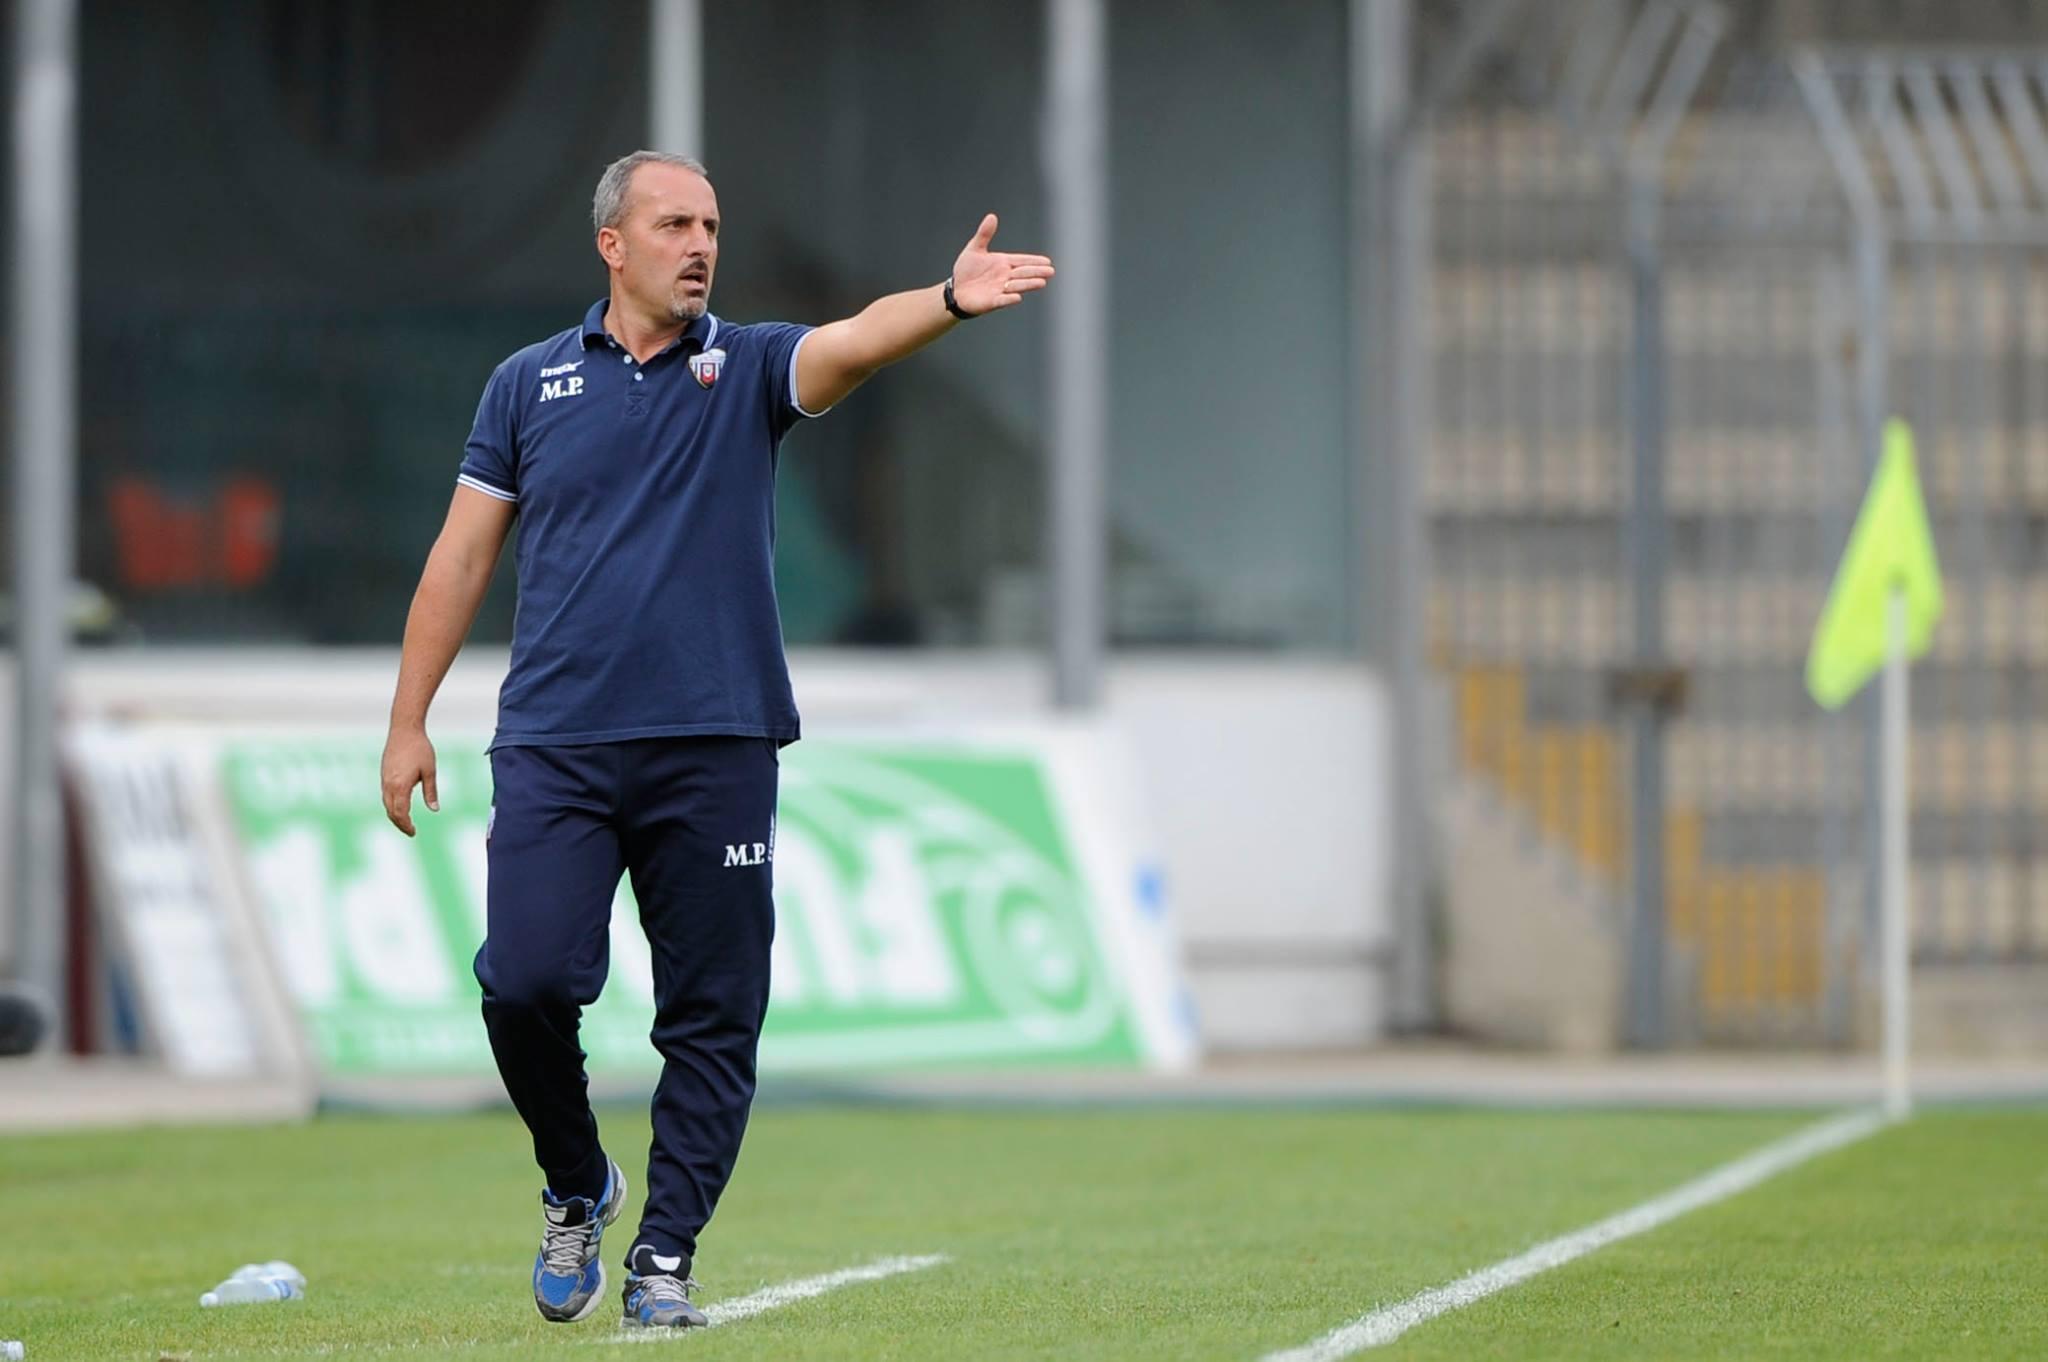 Uno straordinario Akragas compie l'impresa, Catania sconfitto 2-1